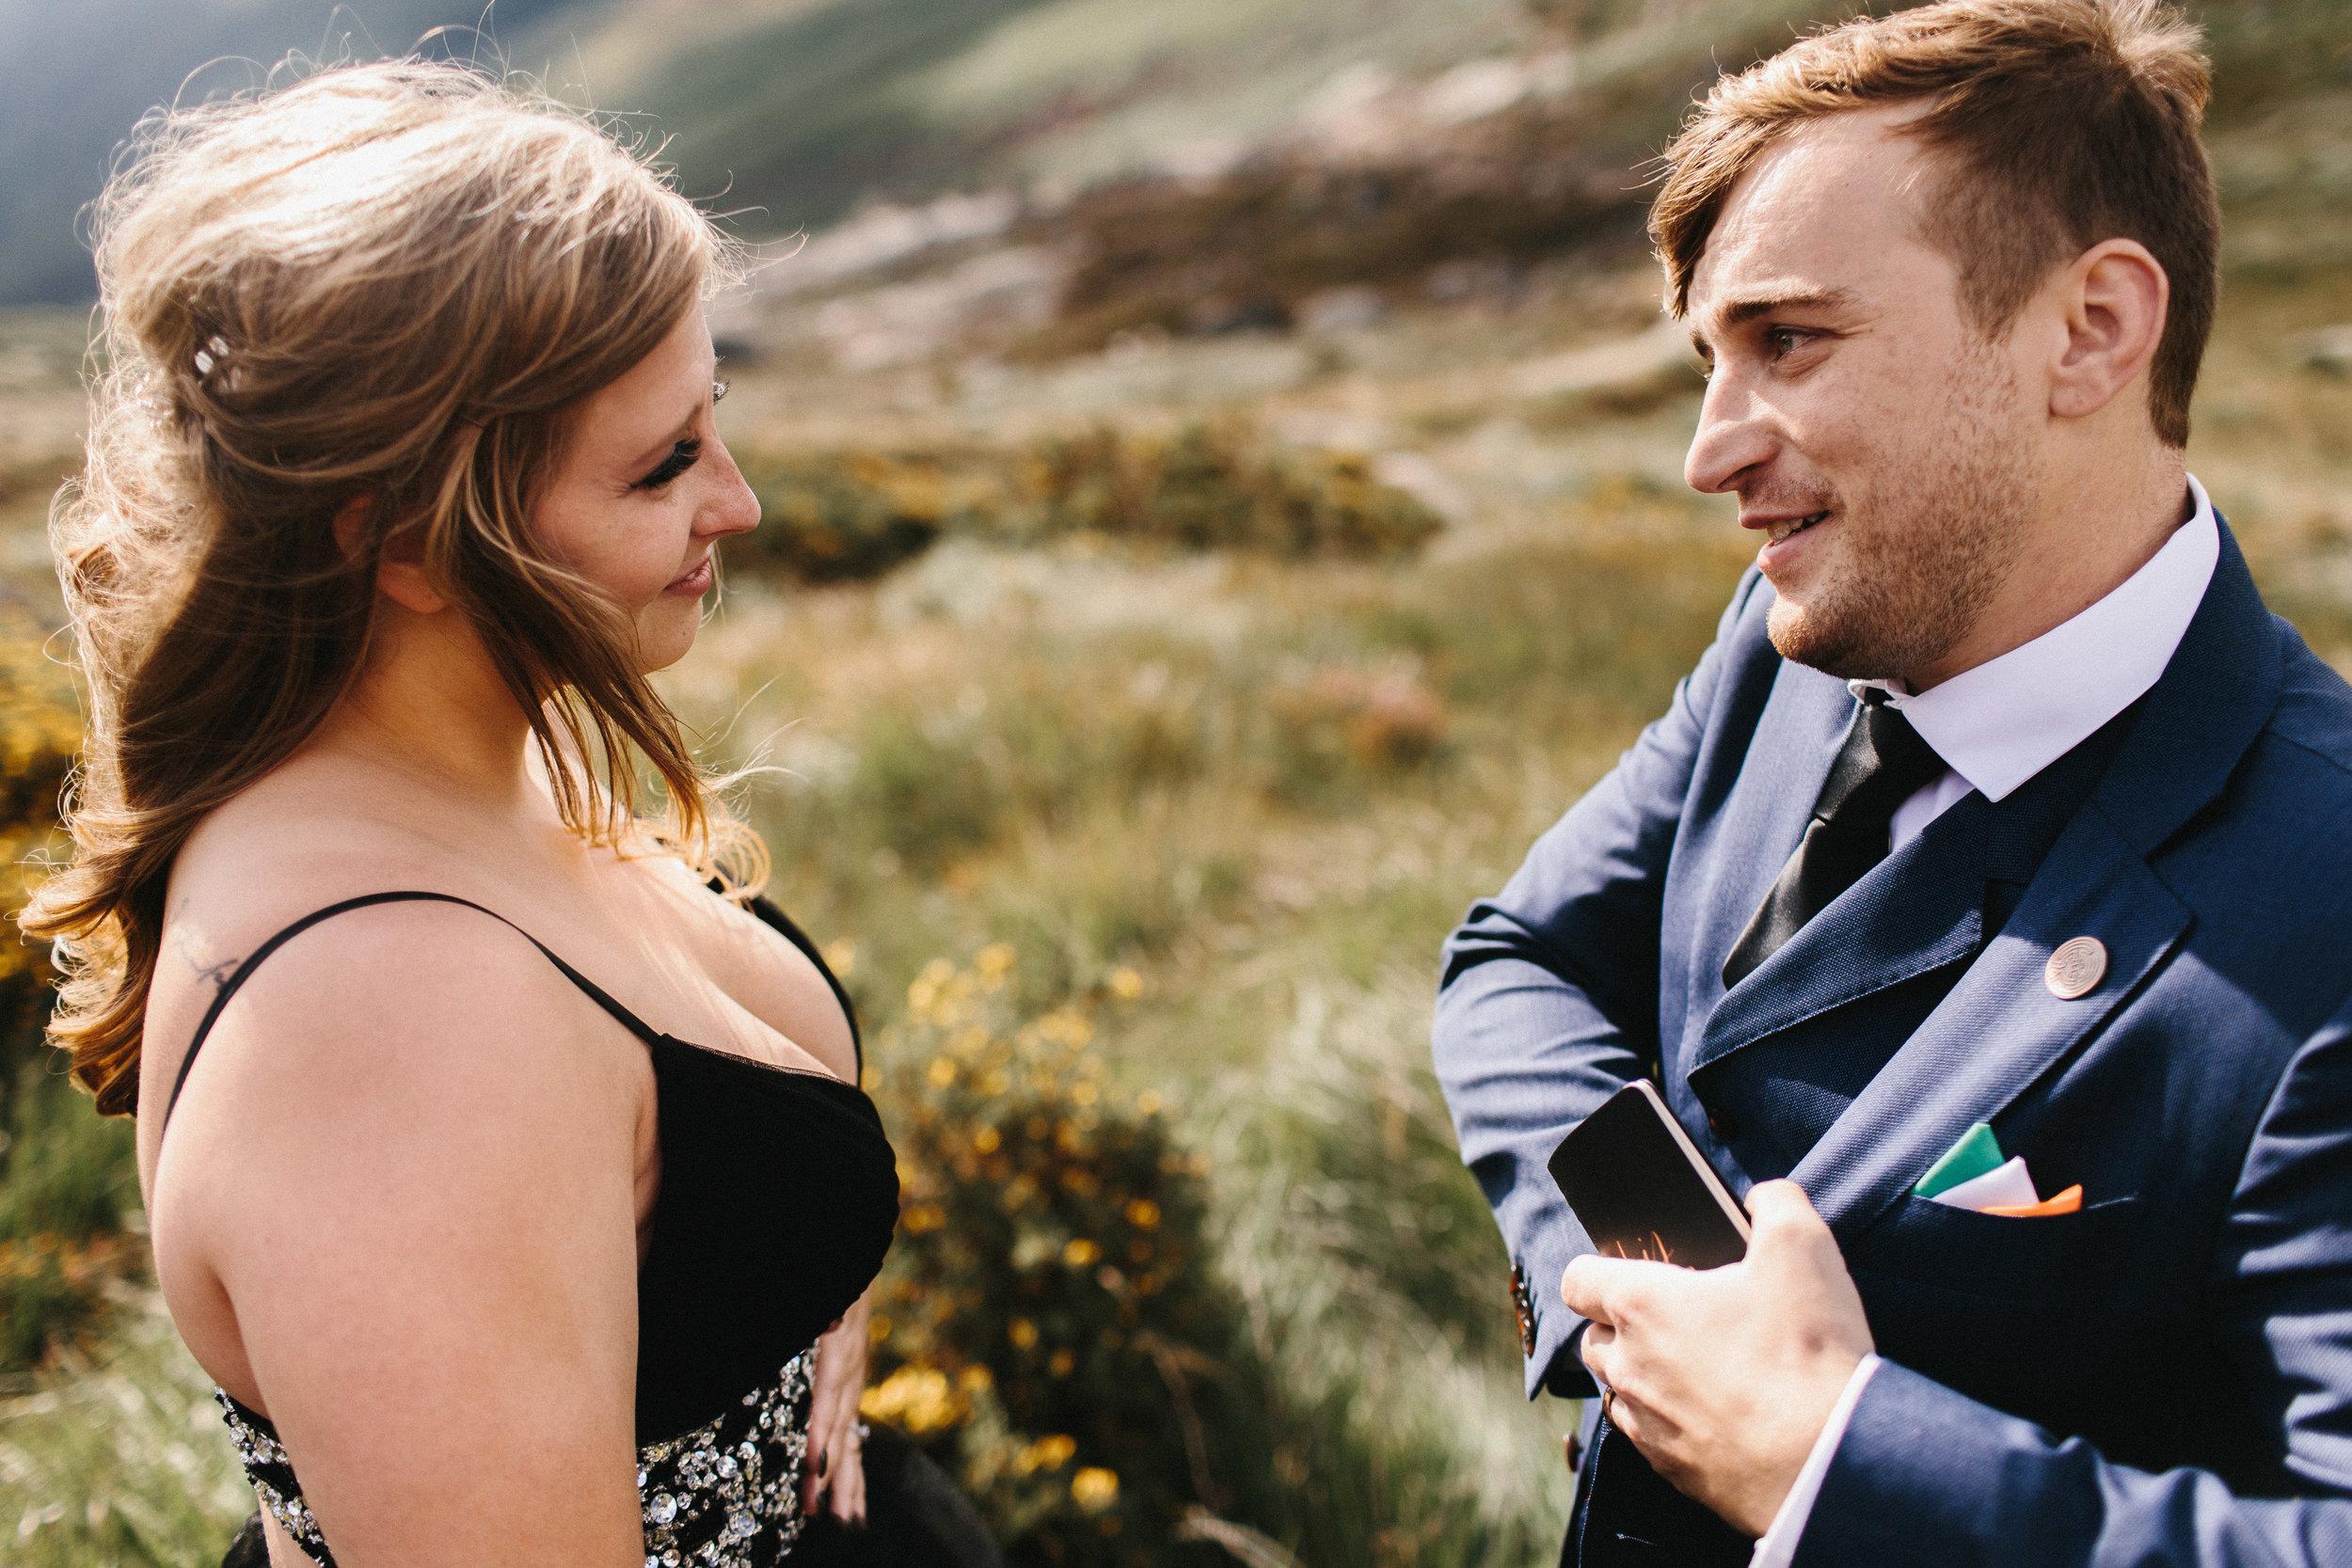 ireland_elopement_black_wedding_dress_wicklow_glendalough_athy_st_kevins_way_1233.jpg